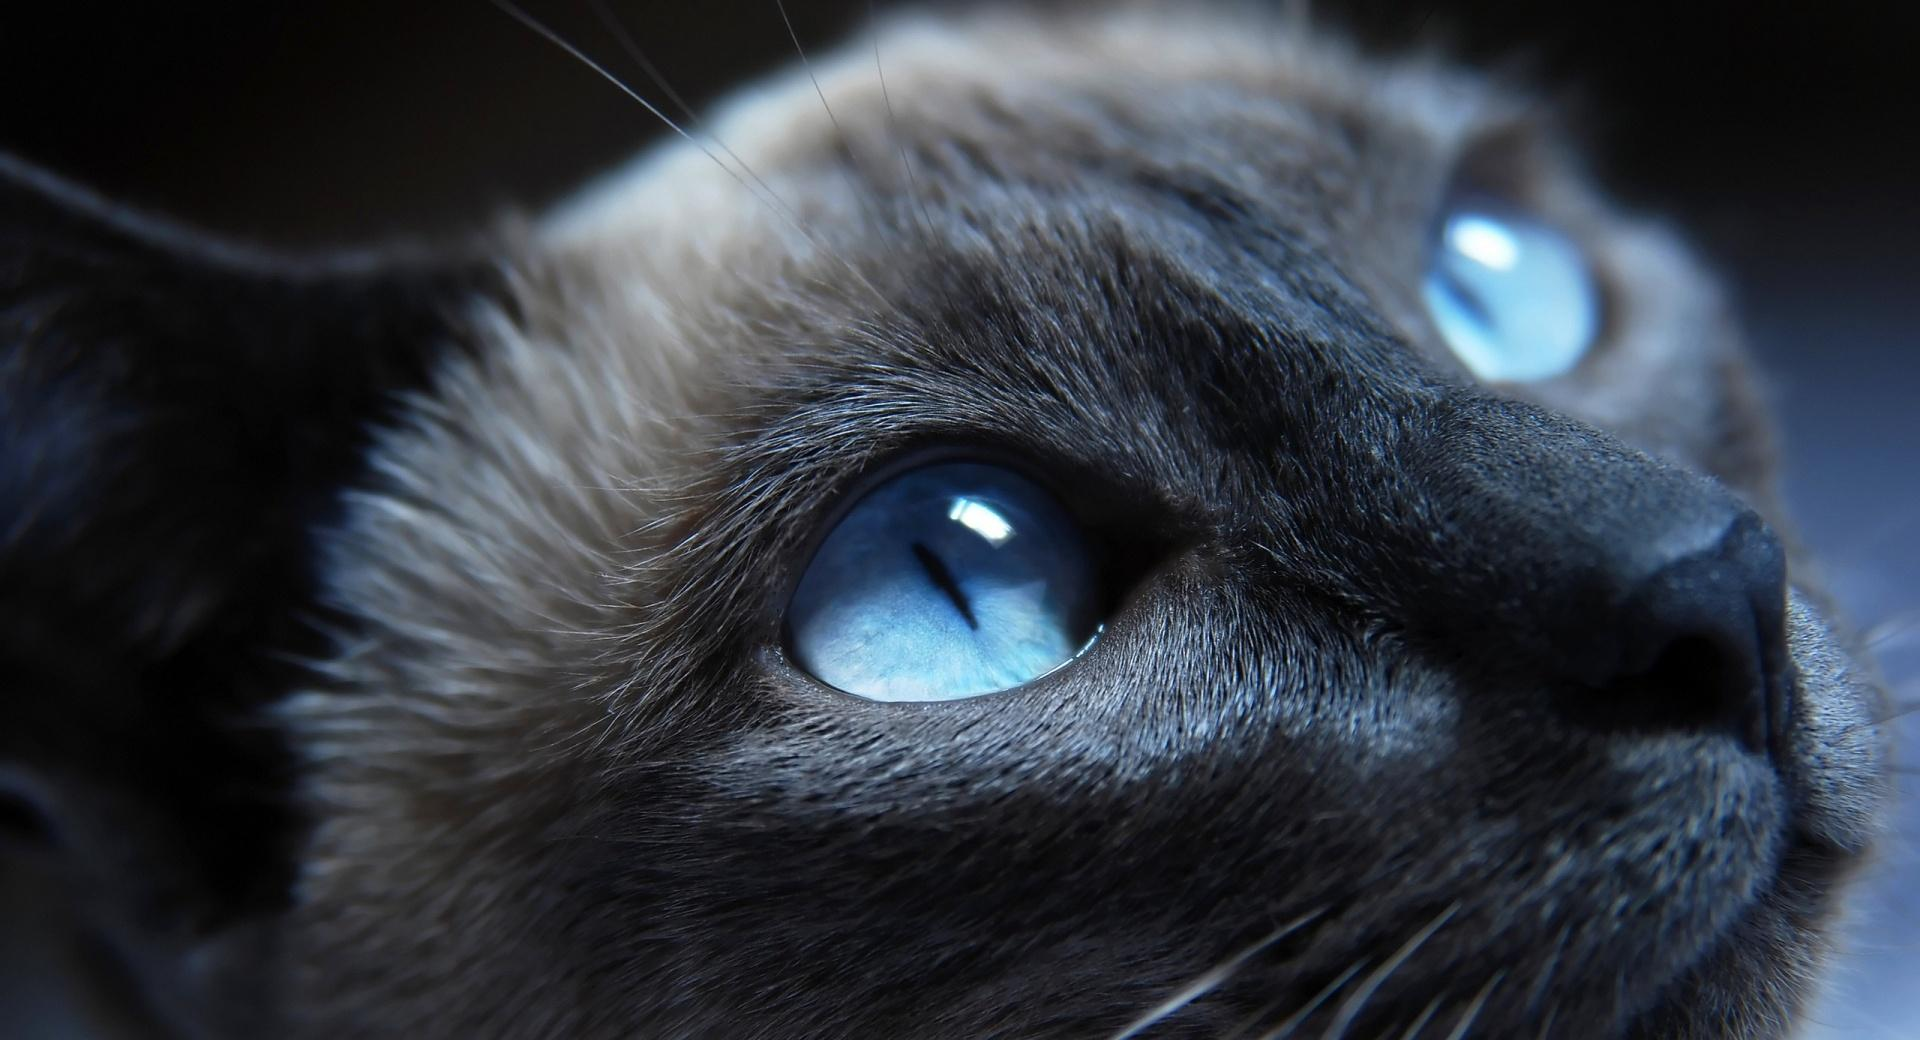 Beautiful Cat Portrait wallpapers HD quality